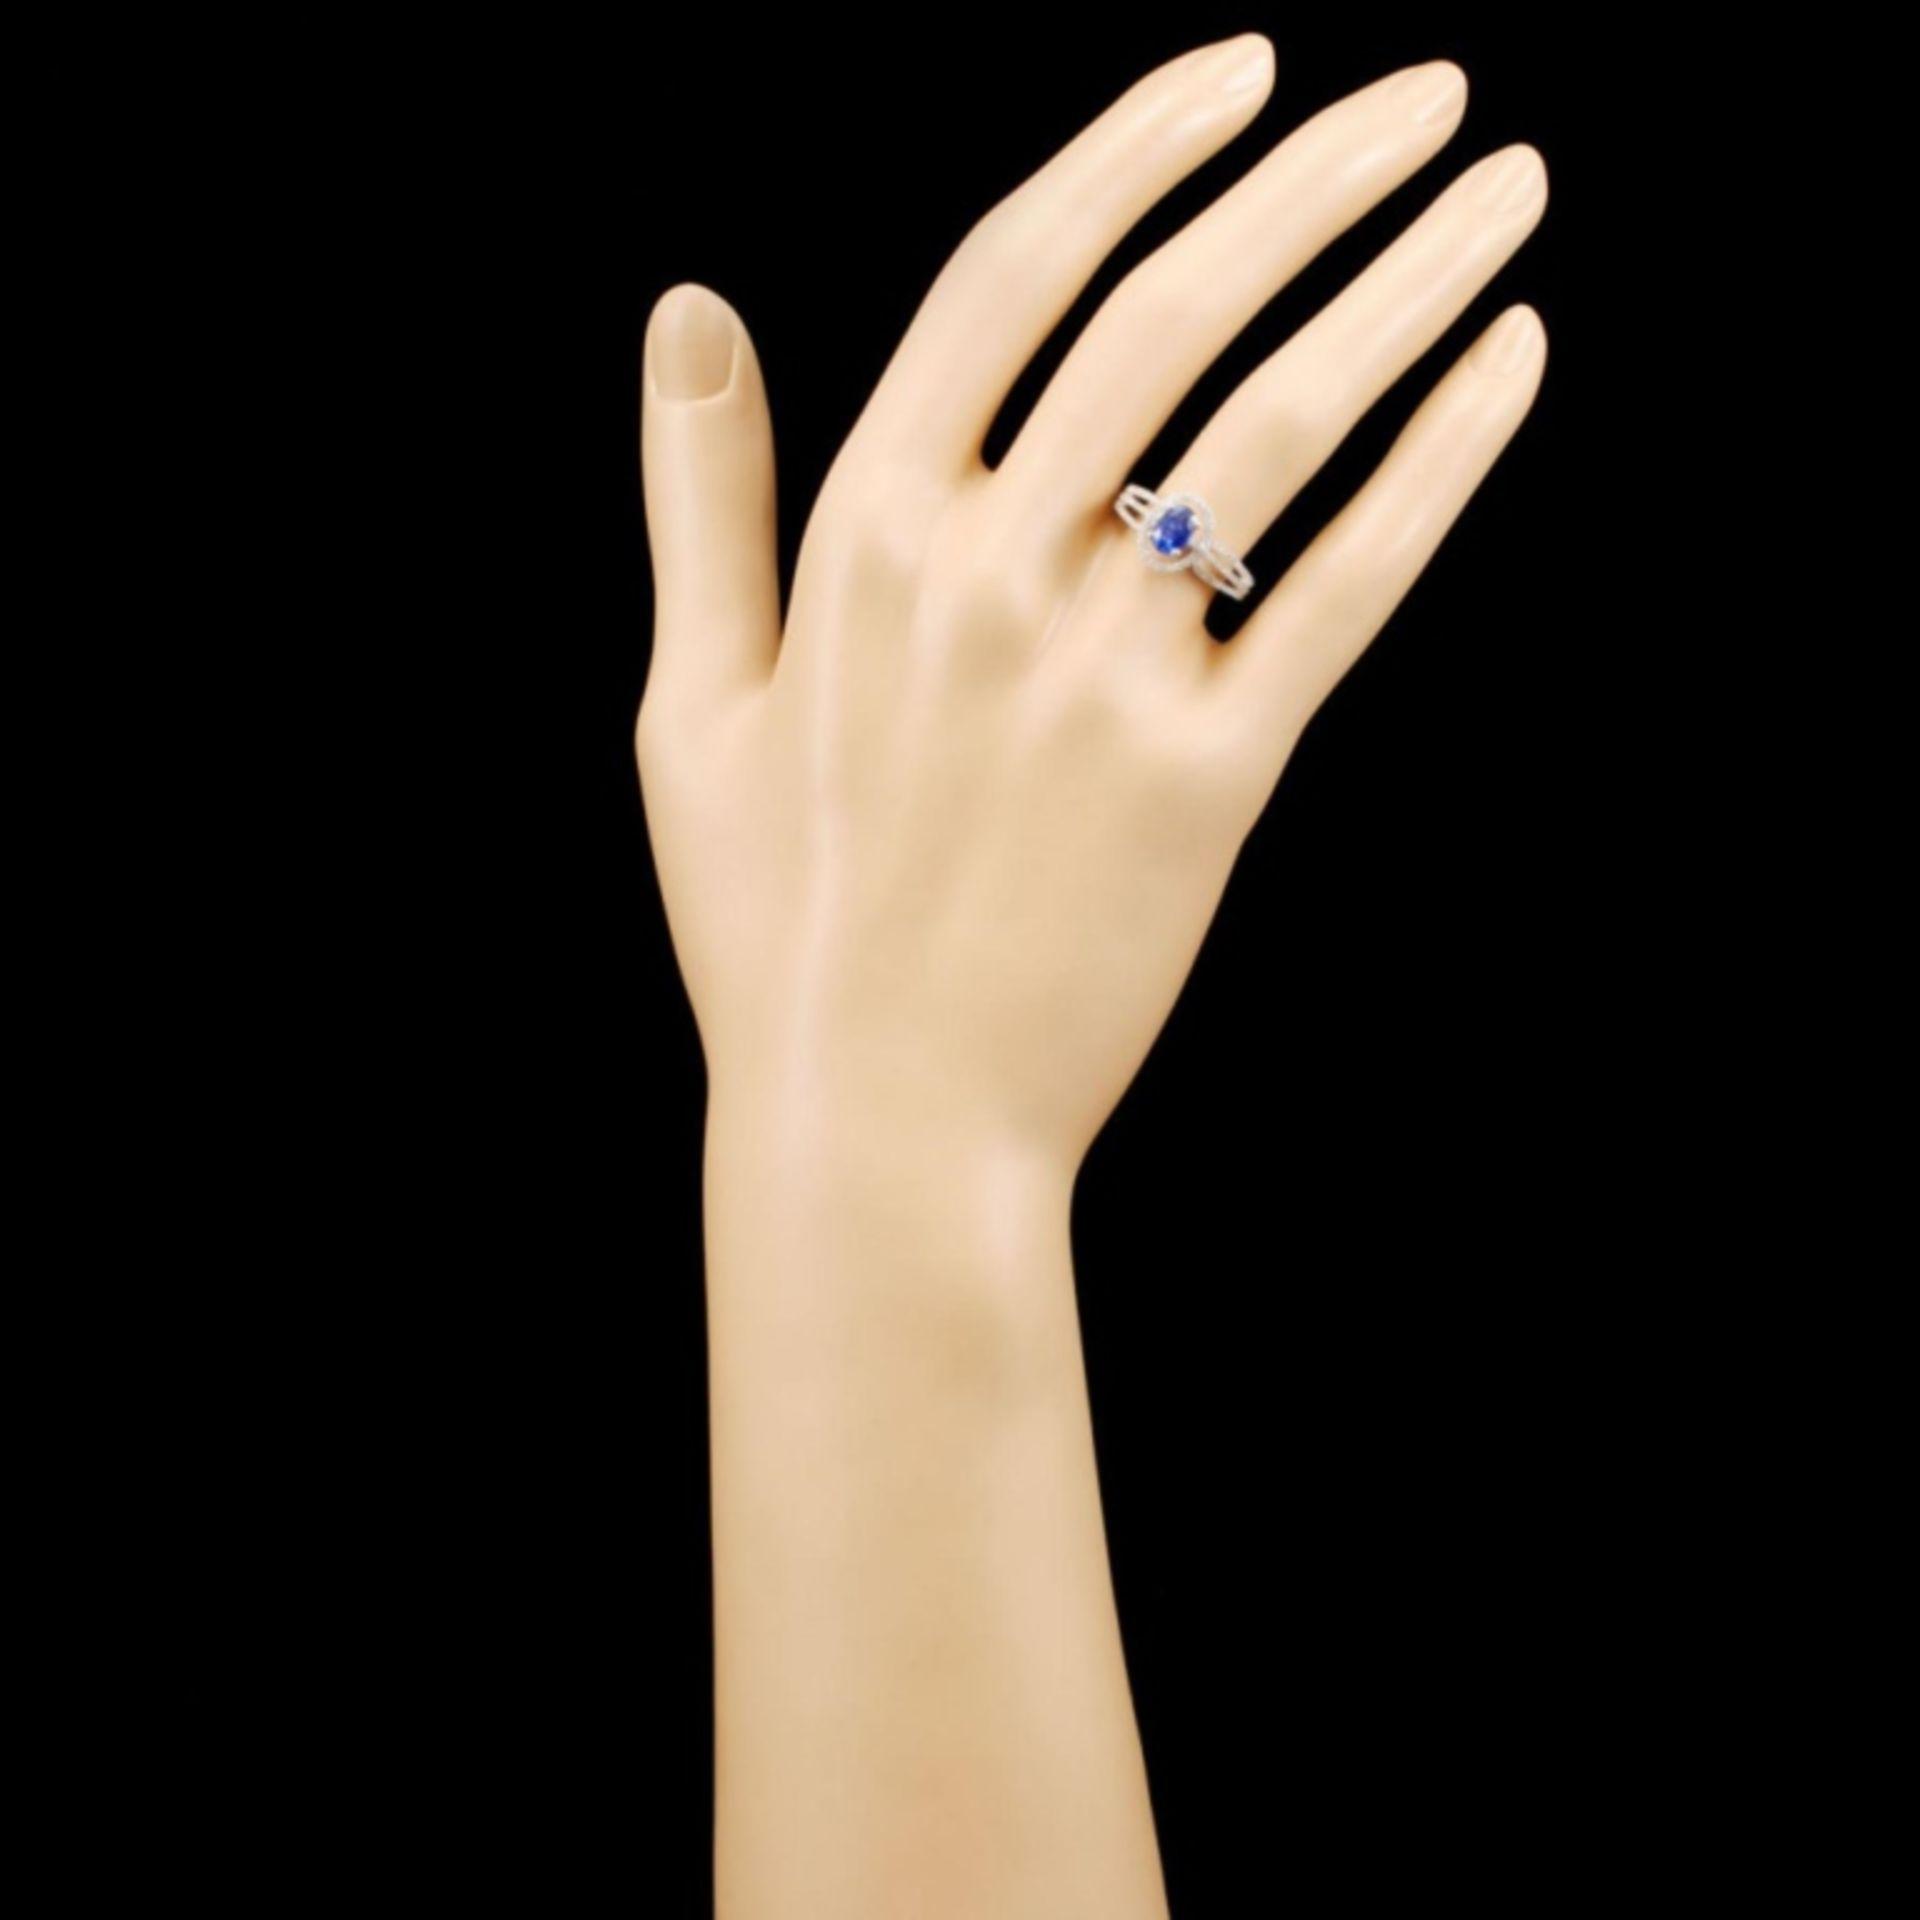 18K Gold 0.86ct Sapphire & 0.32ctw Diamond Ring - Image 4 of 5